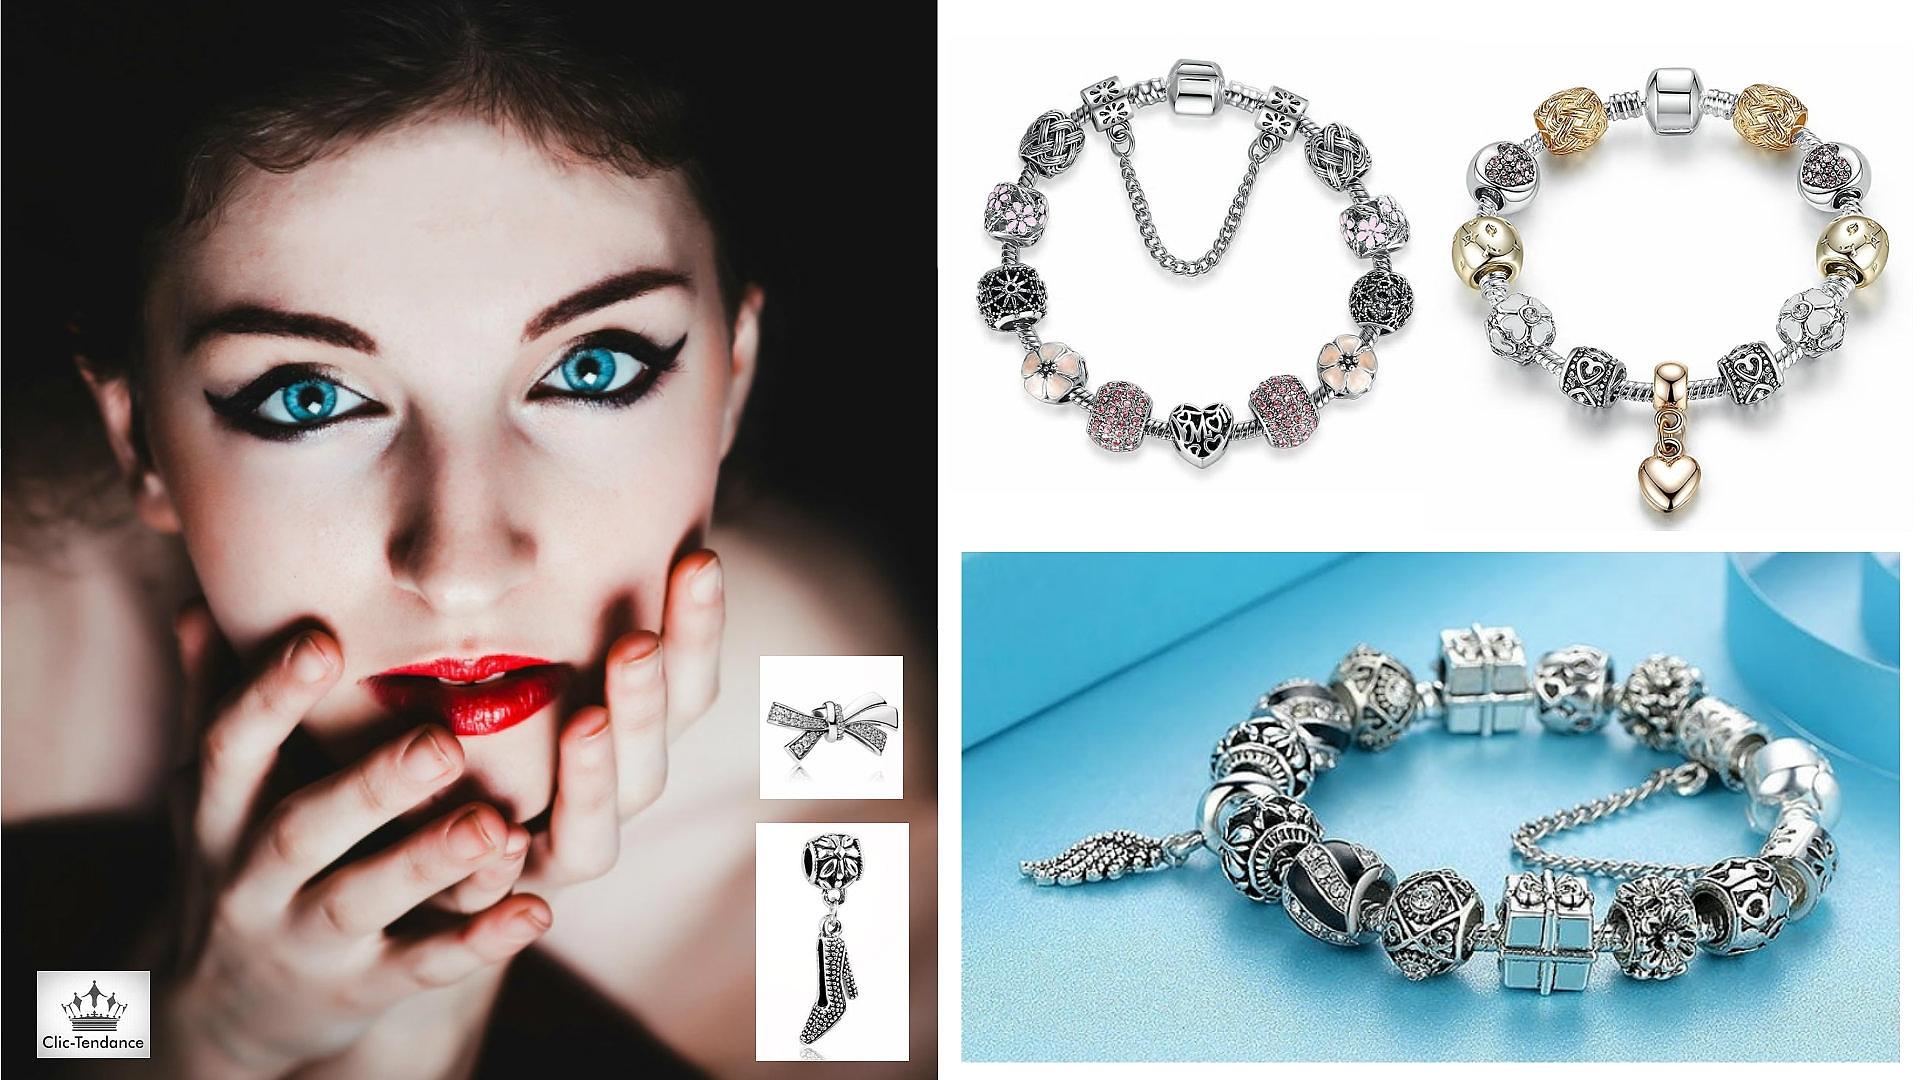 bracelet Charms - l'inspiration bijou fantaisie personnalisable style Pandora